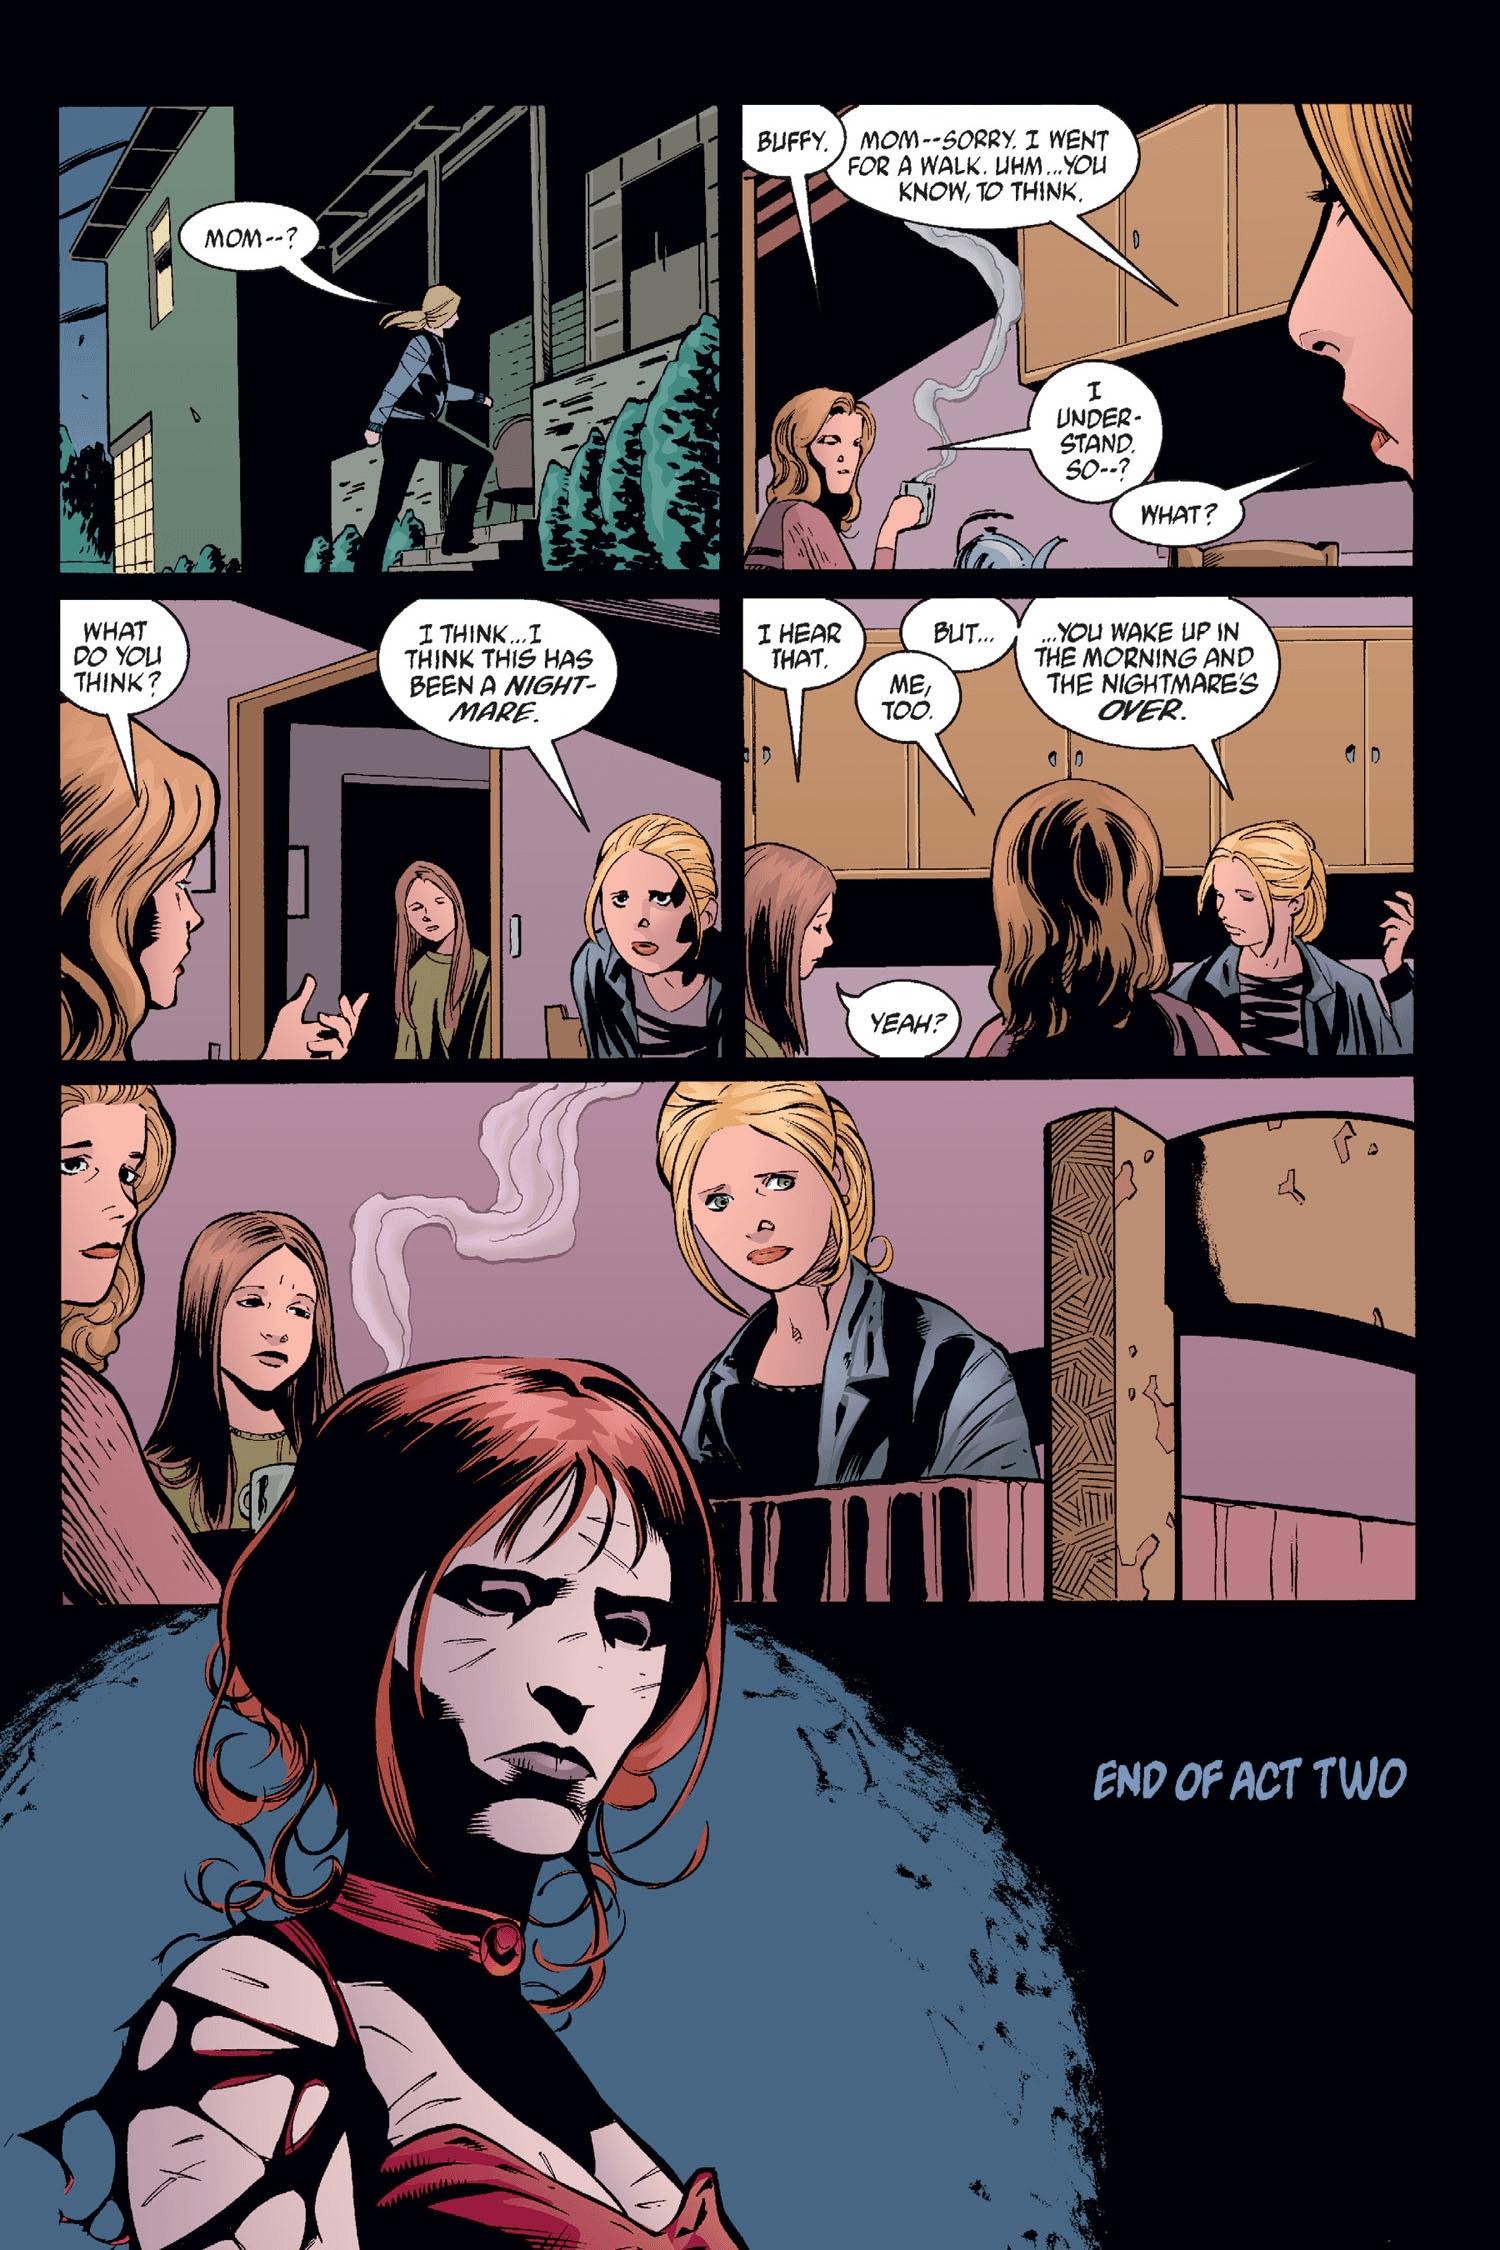 Read online Buffy the Vampire Slayer: Omnibus comic -  Issue # TPB 2 - 63